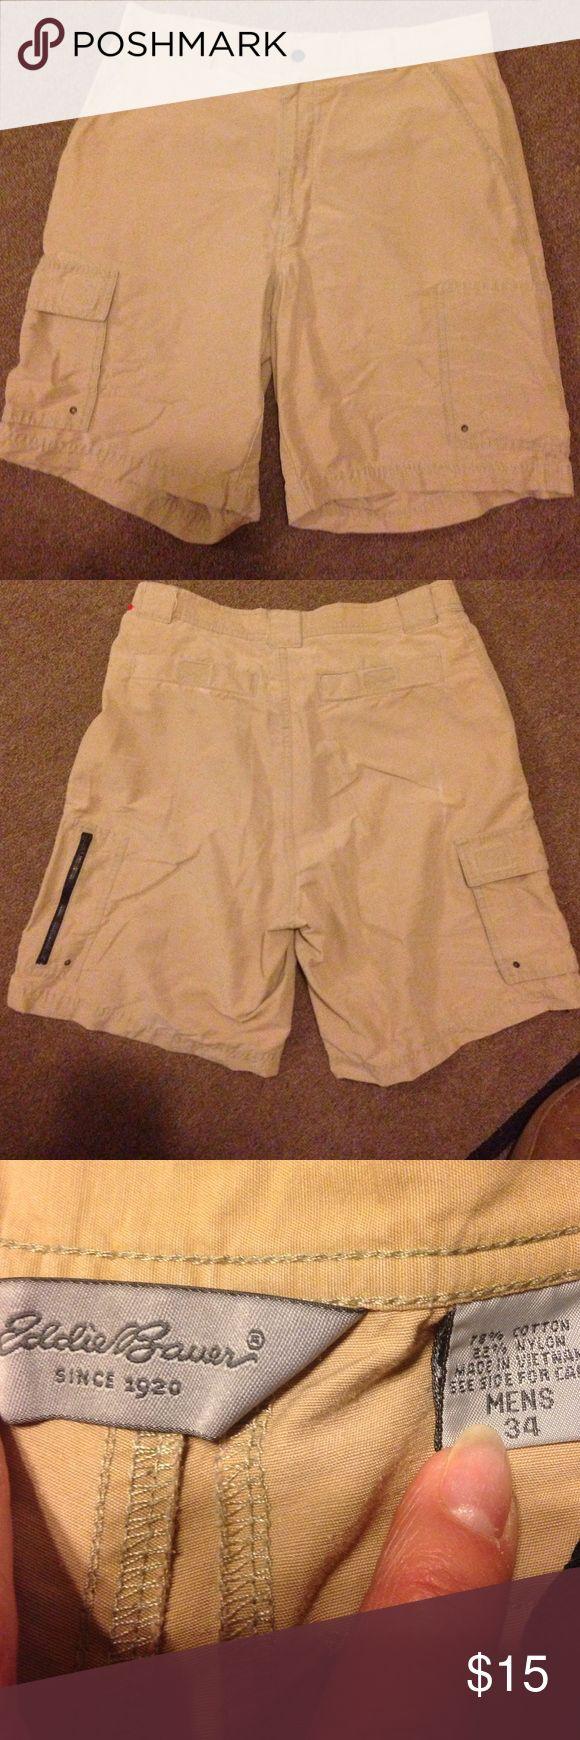 Eddie Bauer shorts. Men's Sz 34 Eddie Bauer shorts. Men's Sz 34. 78% cotton. 22% nylon. Khaki color. 2 back pockets with Velcro fasteners   2 front side pockets. 1 small pocket with Velcro fastener.   Pocket on the side of each leg. One has zipper closure   One has flap with Velcro faster. Zipper fly with snap at waistband.  Nice shorts! Eddie Bauer Shorts